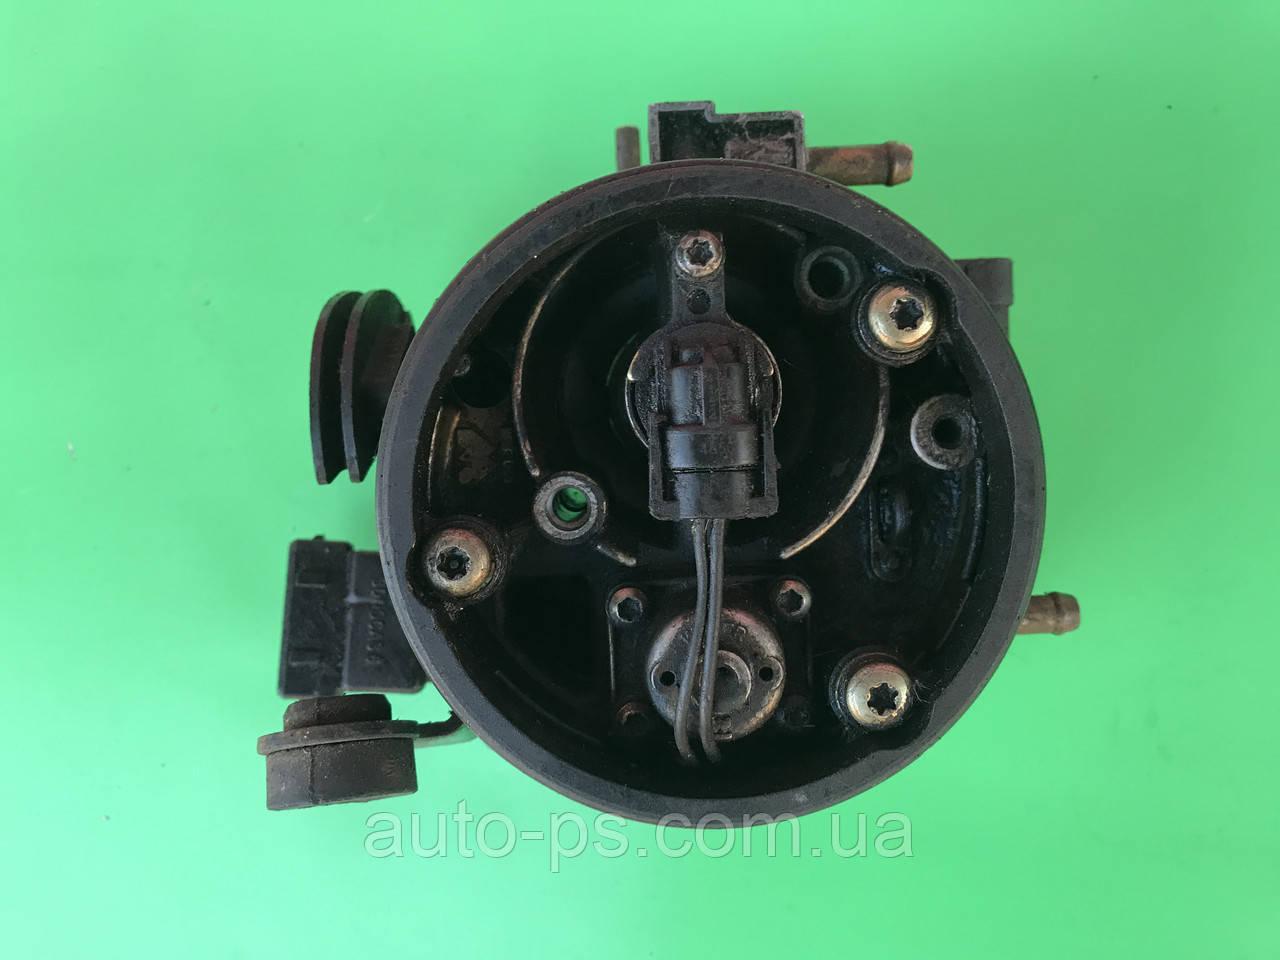 Моноинжектор Peugeot 205 1.1 44kW